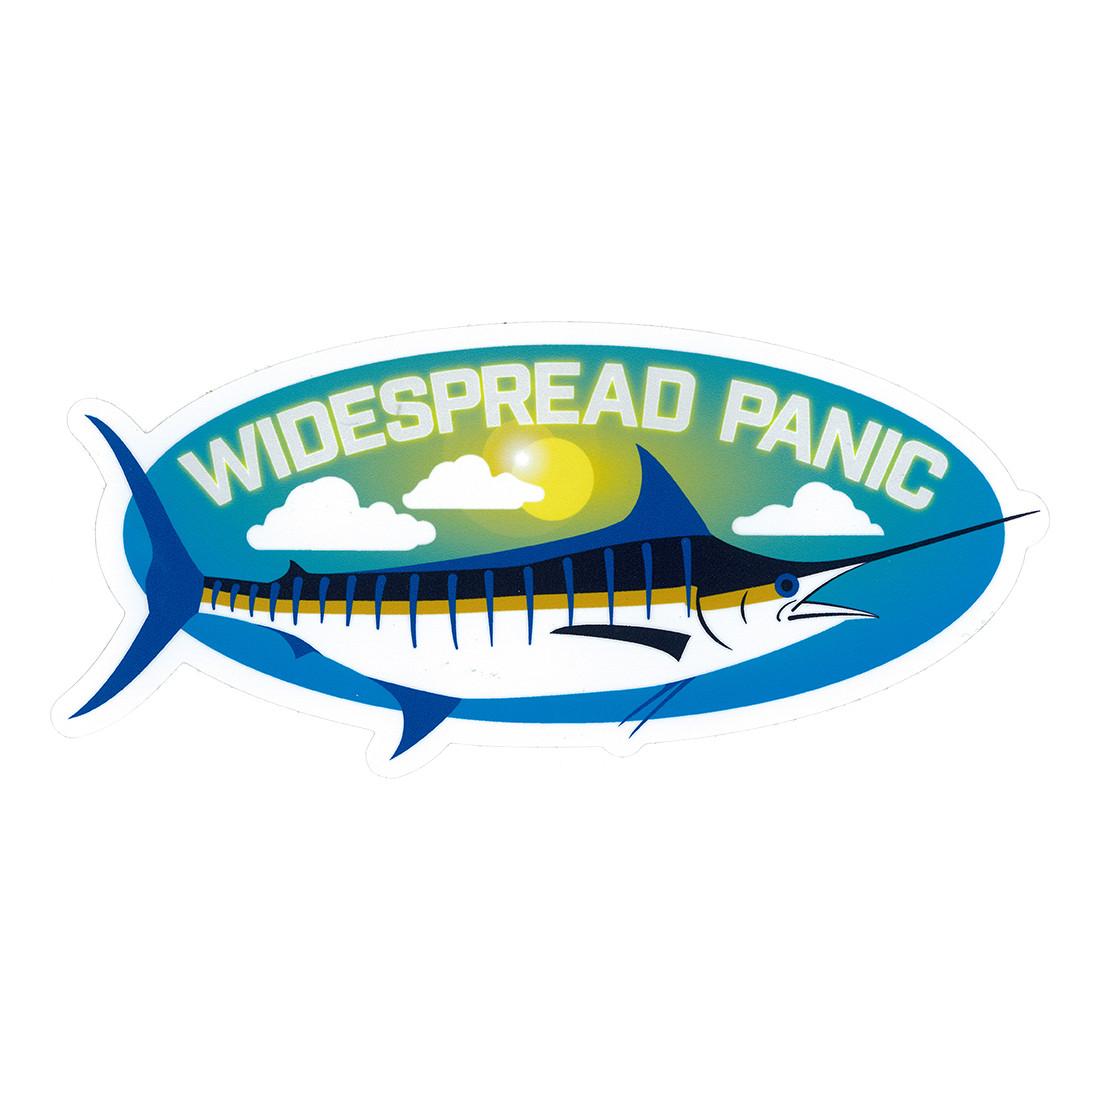 Widespread Panic Blue Marlin Sticker